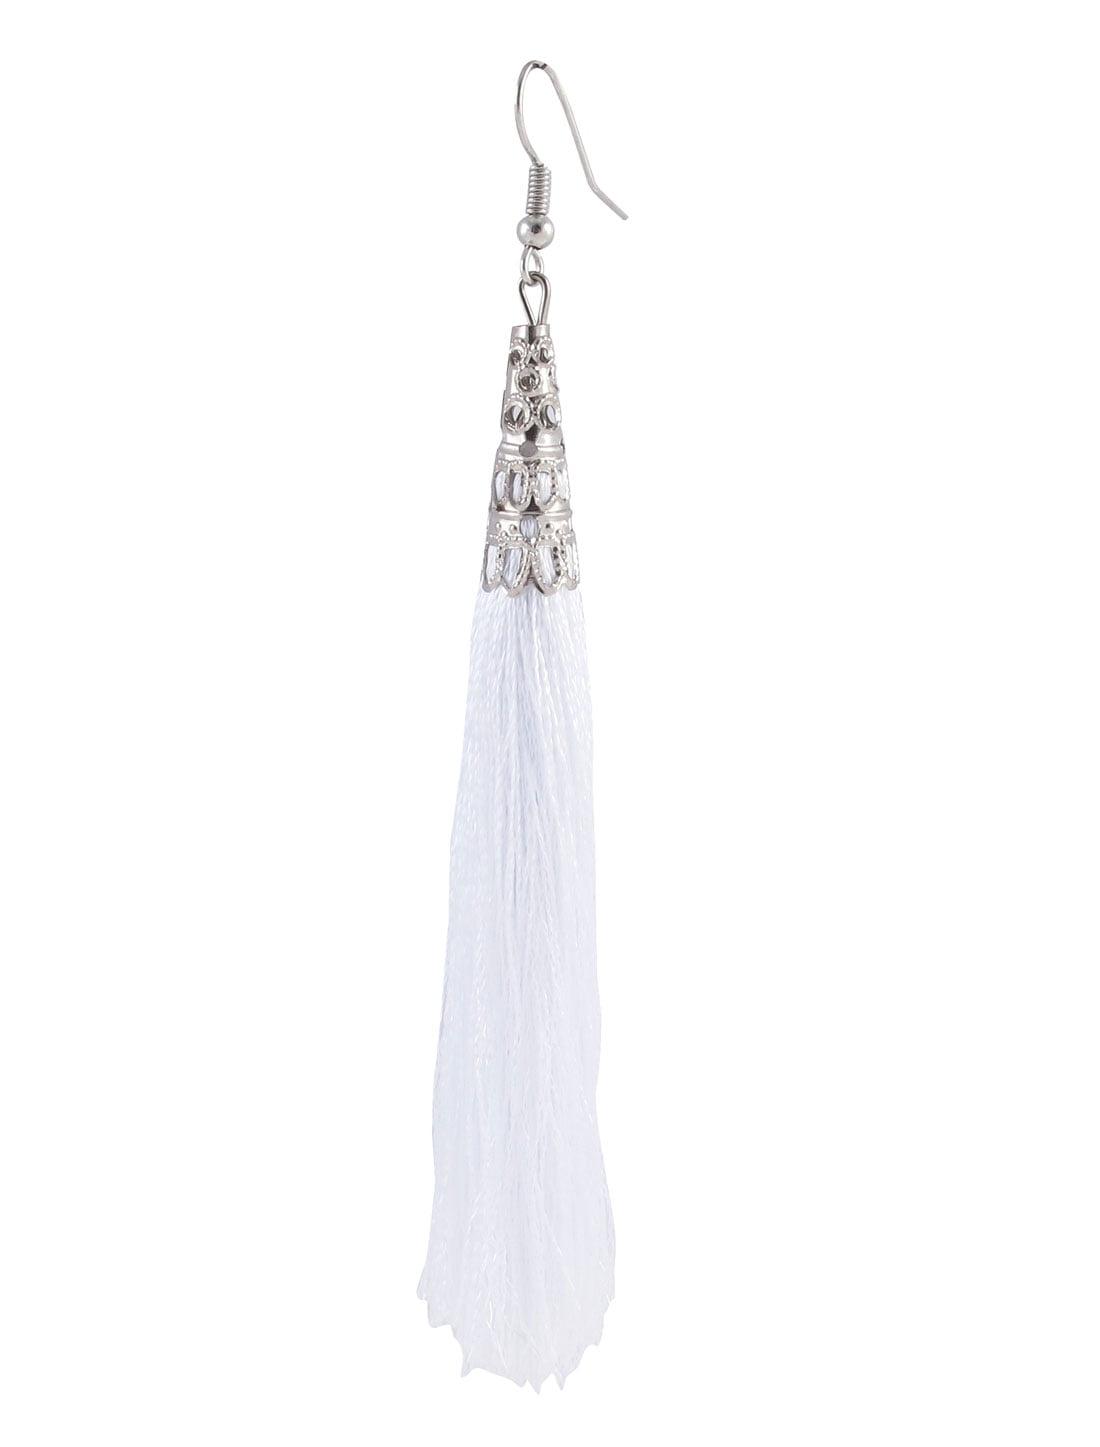 LOVELY Womens Blue Brown Multi Color Beads Dangle Drop Silver-Tone Hook Earrings